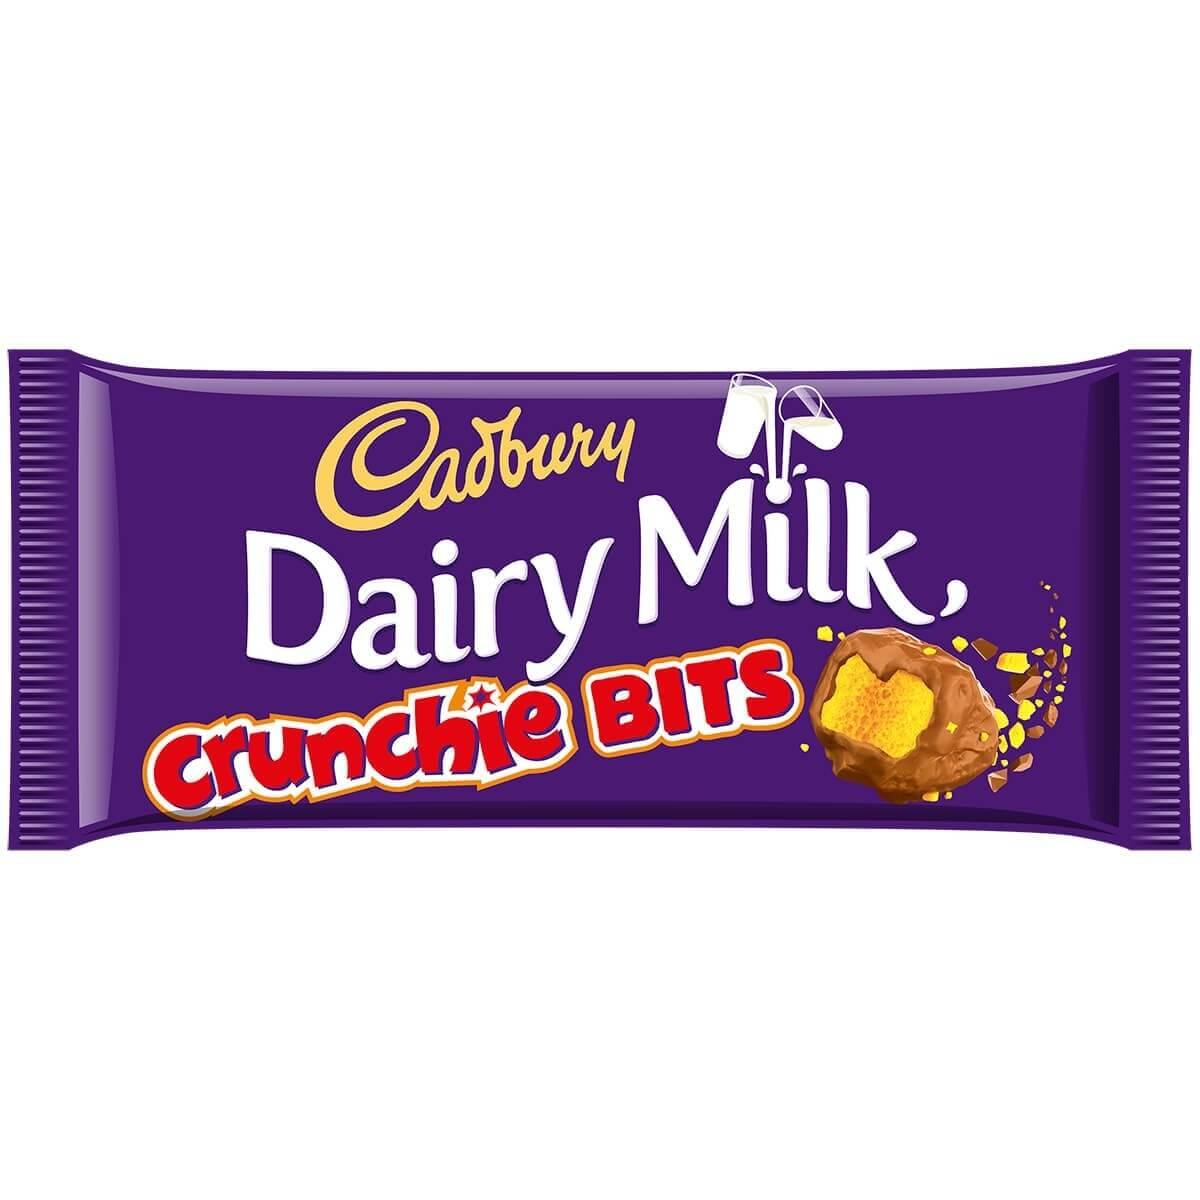 Bild av Cadbury Dairy Milk with Crunchie Bits 200g